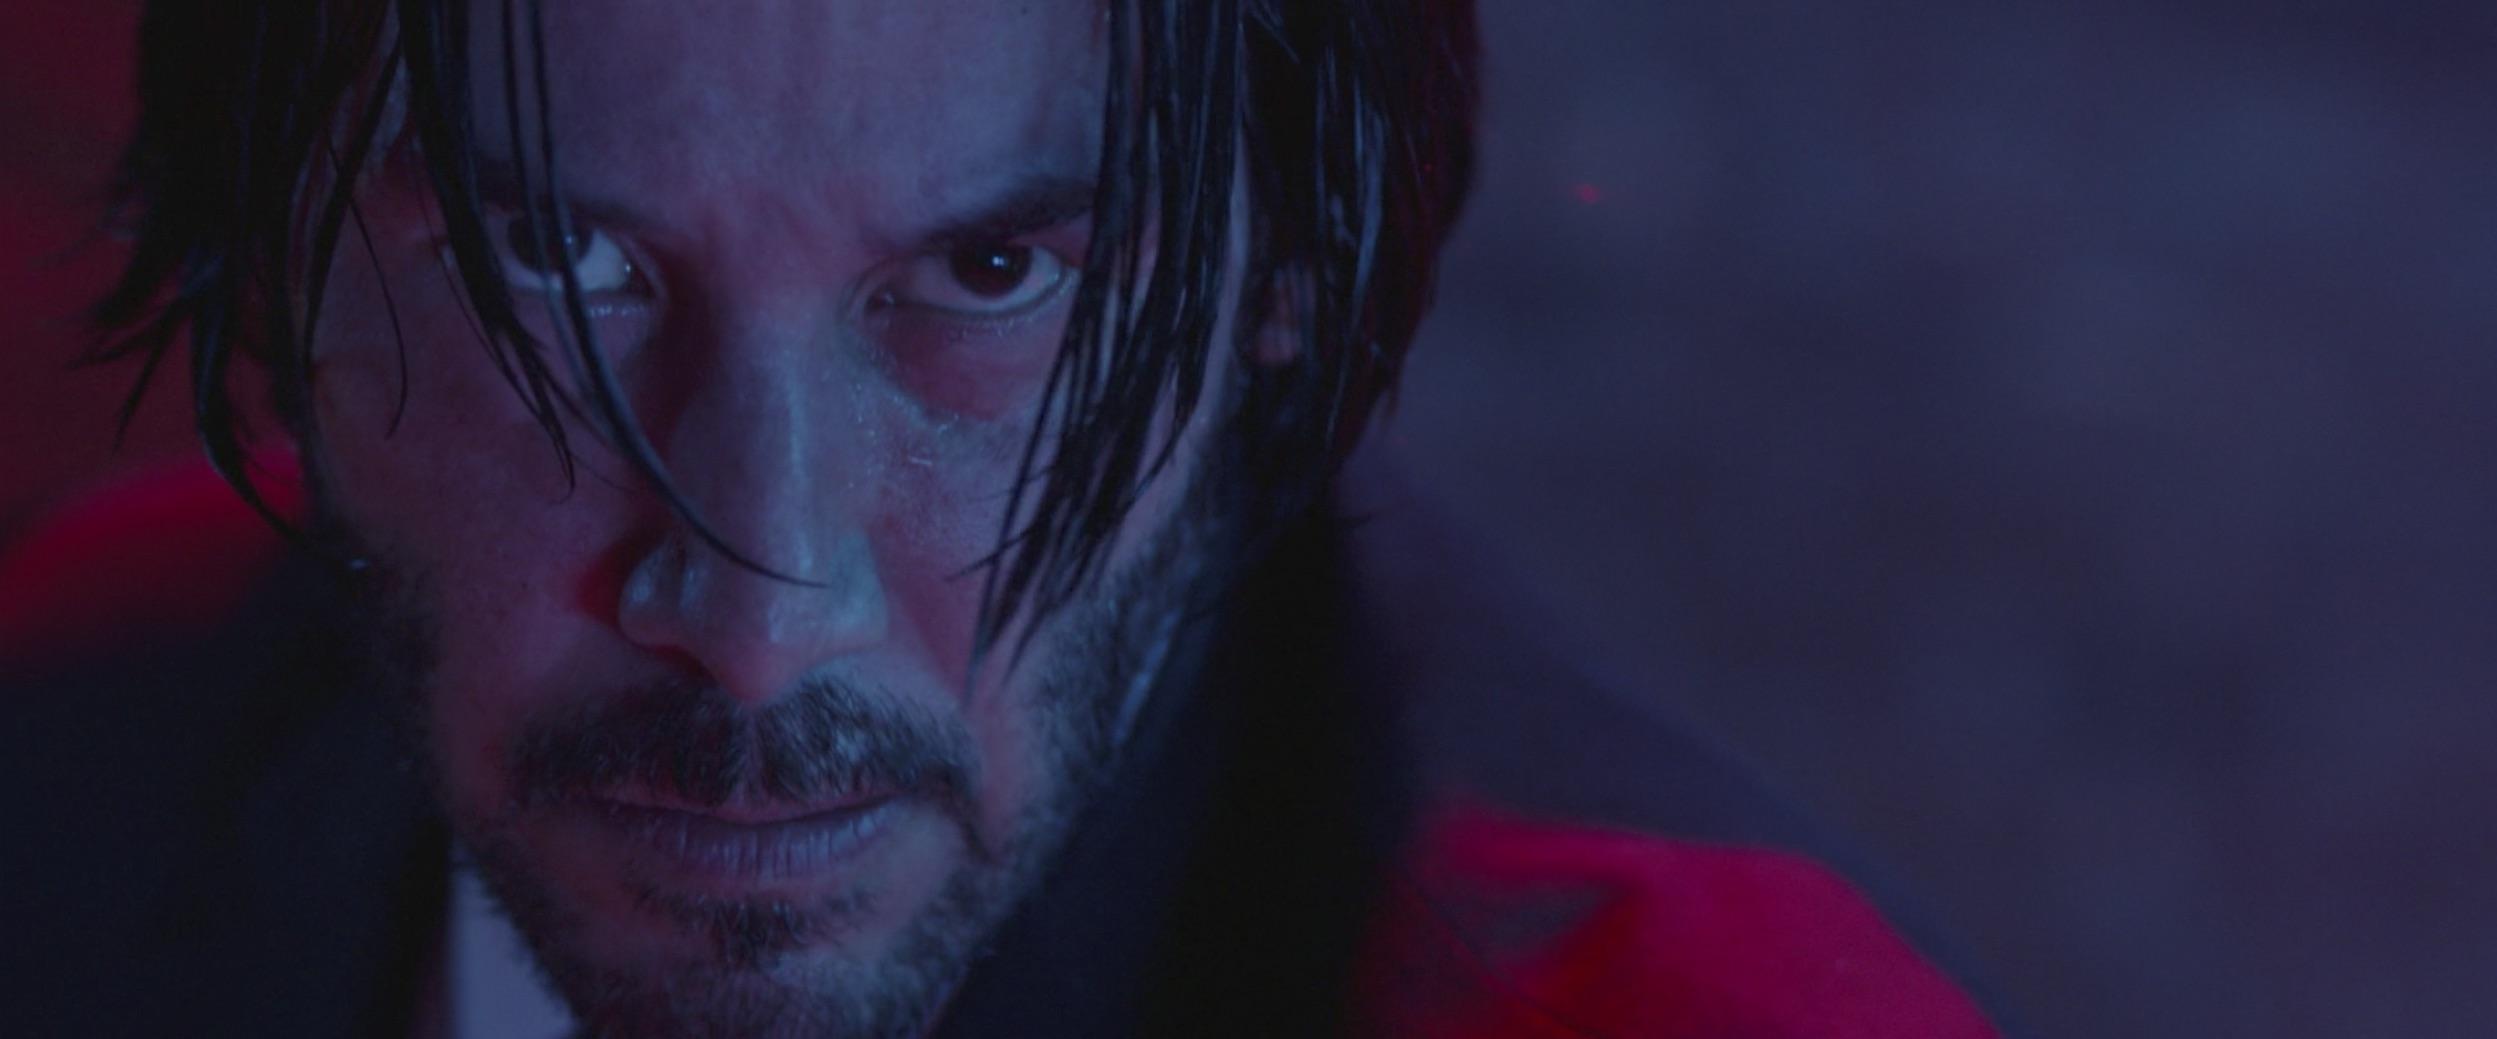 Keanu Reeves close up